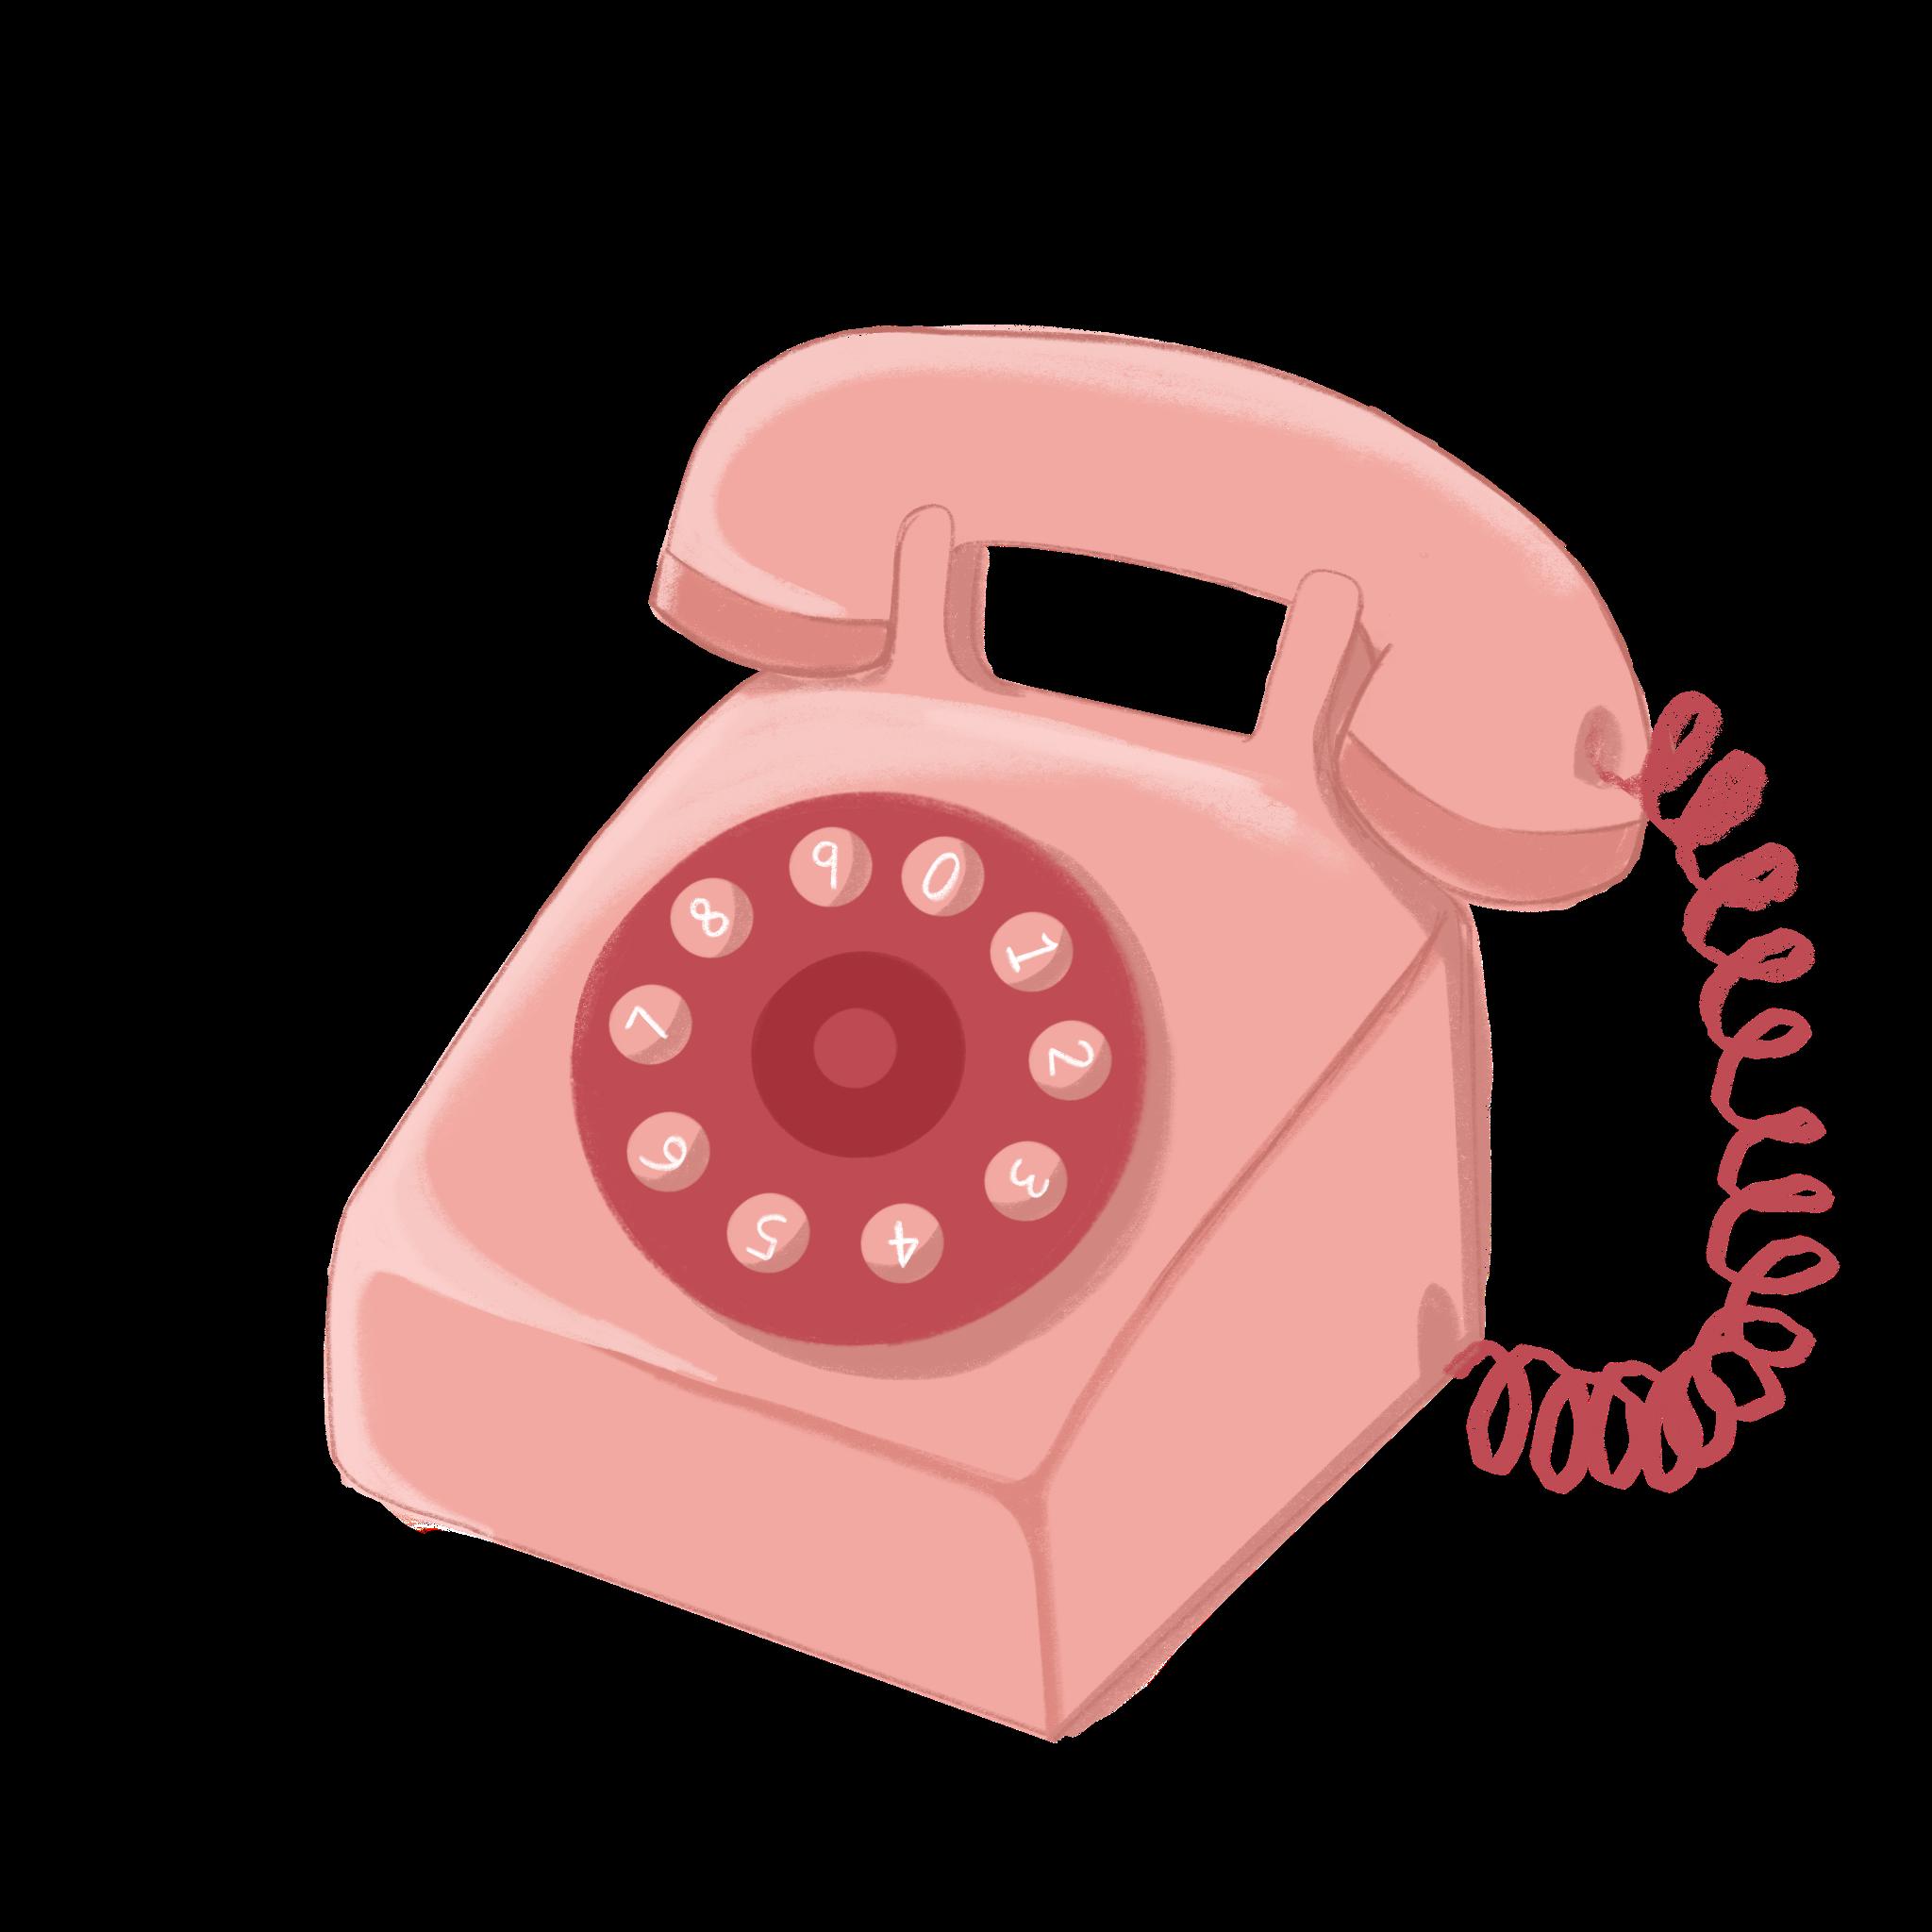 Telephone contact Carys Williams Illustrator